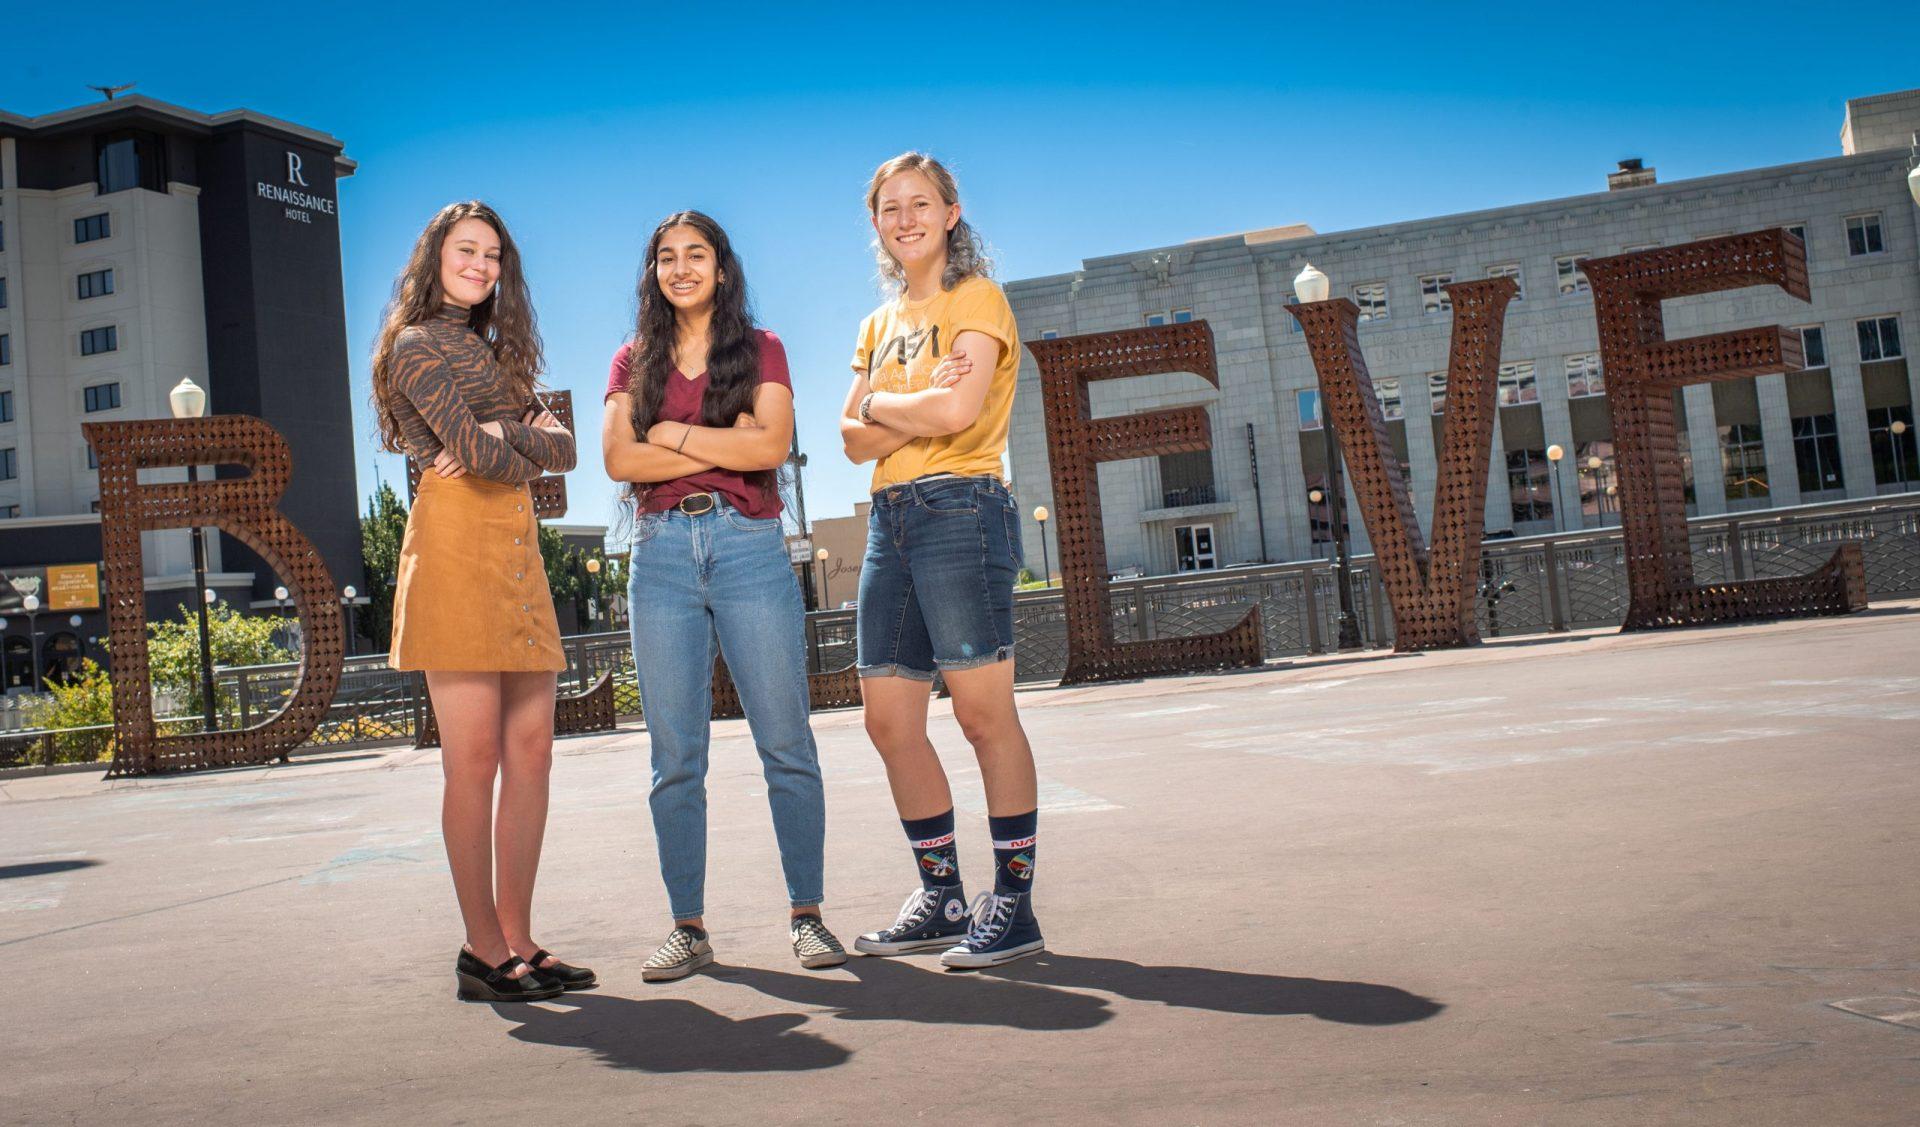 Left to right, Anastasia Chevalier, Eakjot Sekhon and Lara Cassity. Photo by Nick Higman Photography.